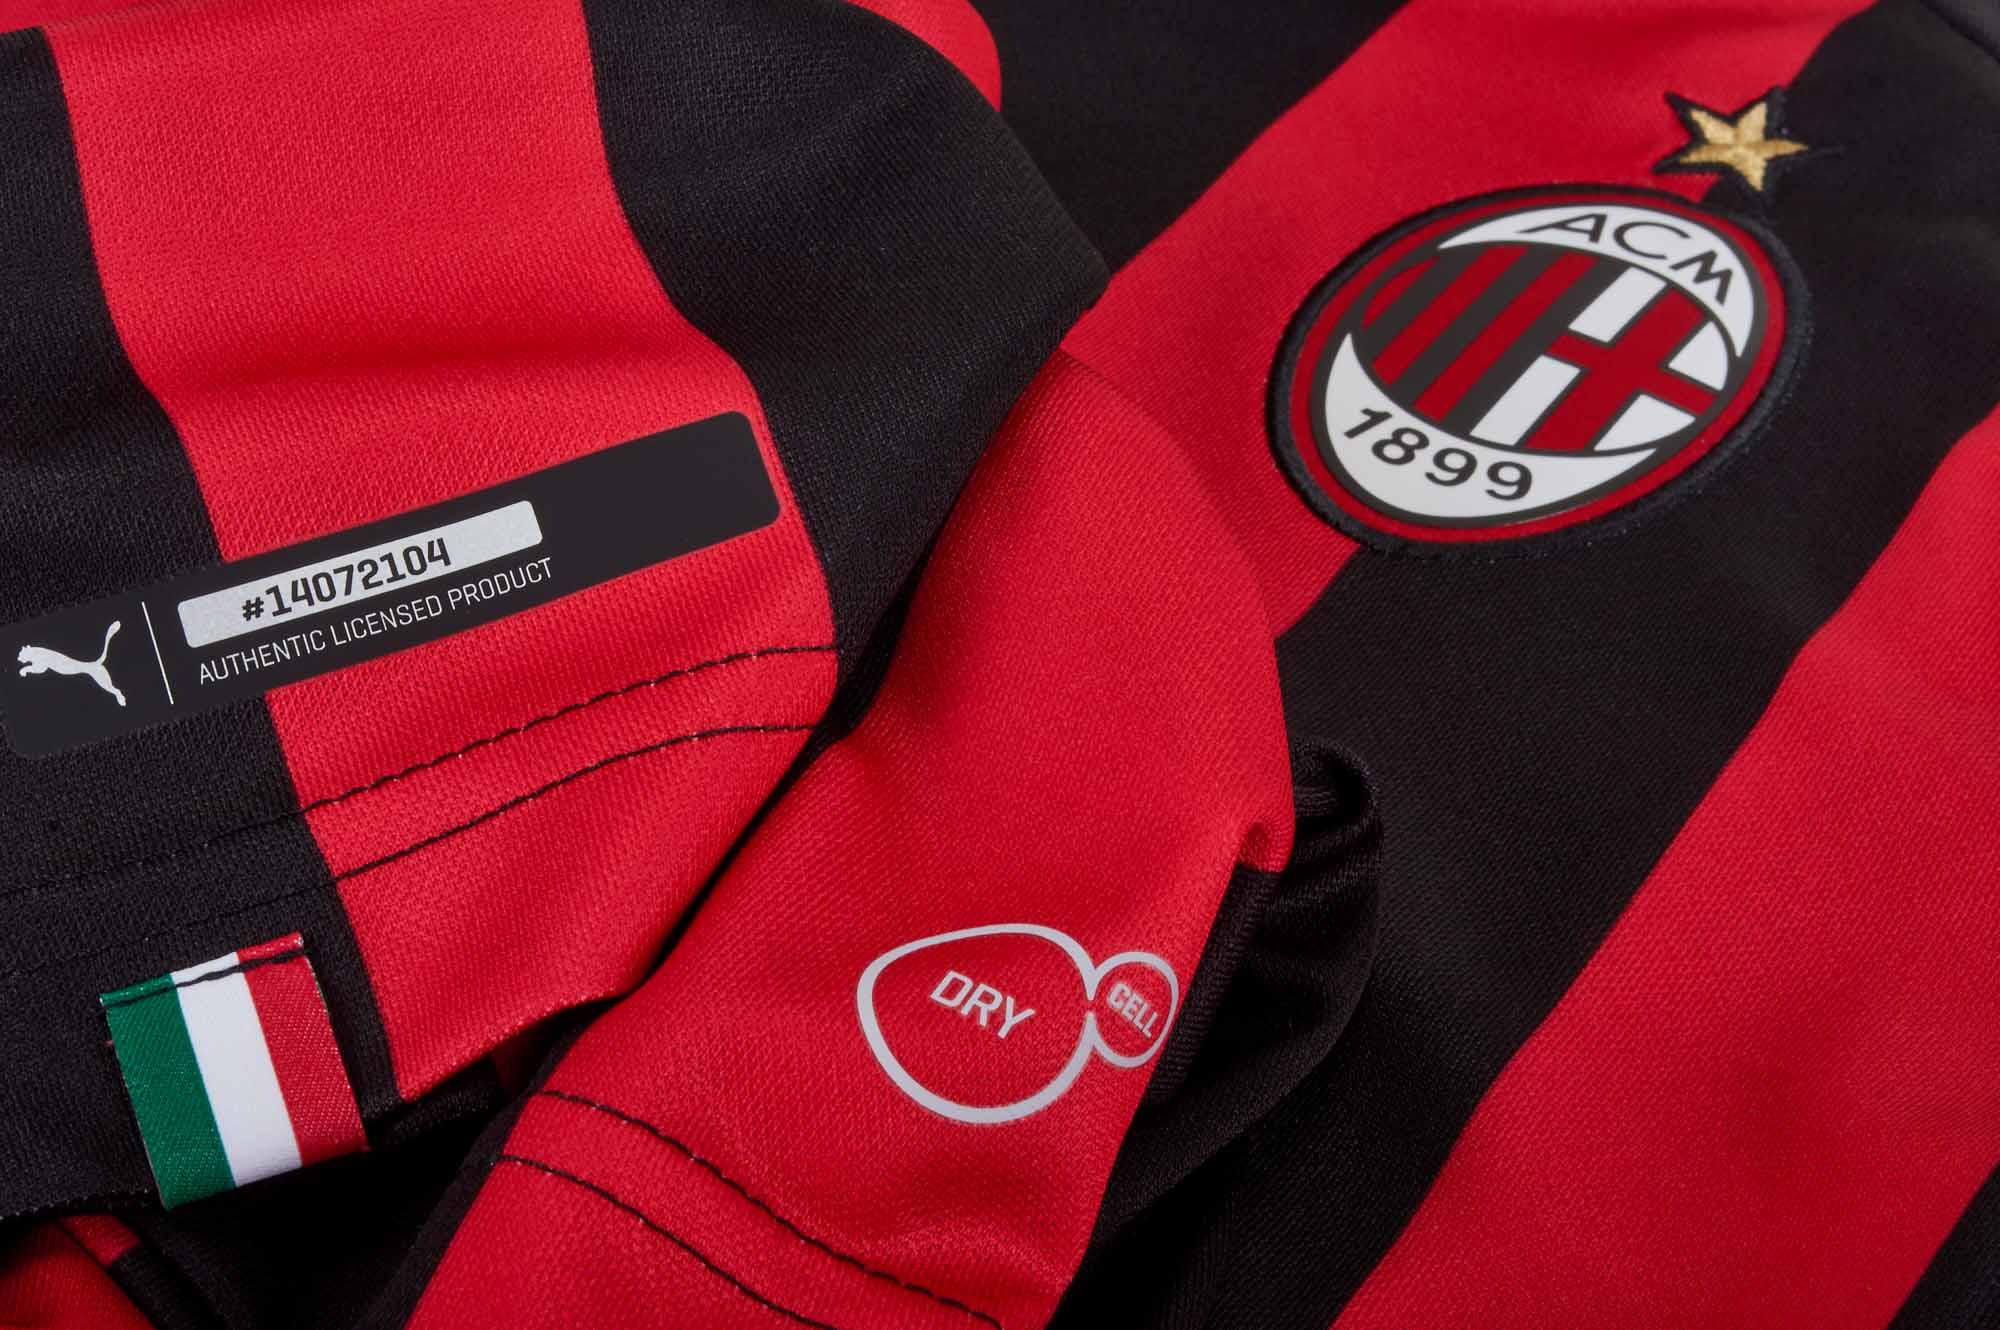 bc9c610be PUMA AC Milan Home Jersey - Chili Pepper/Black - SoccerPro